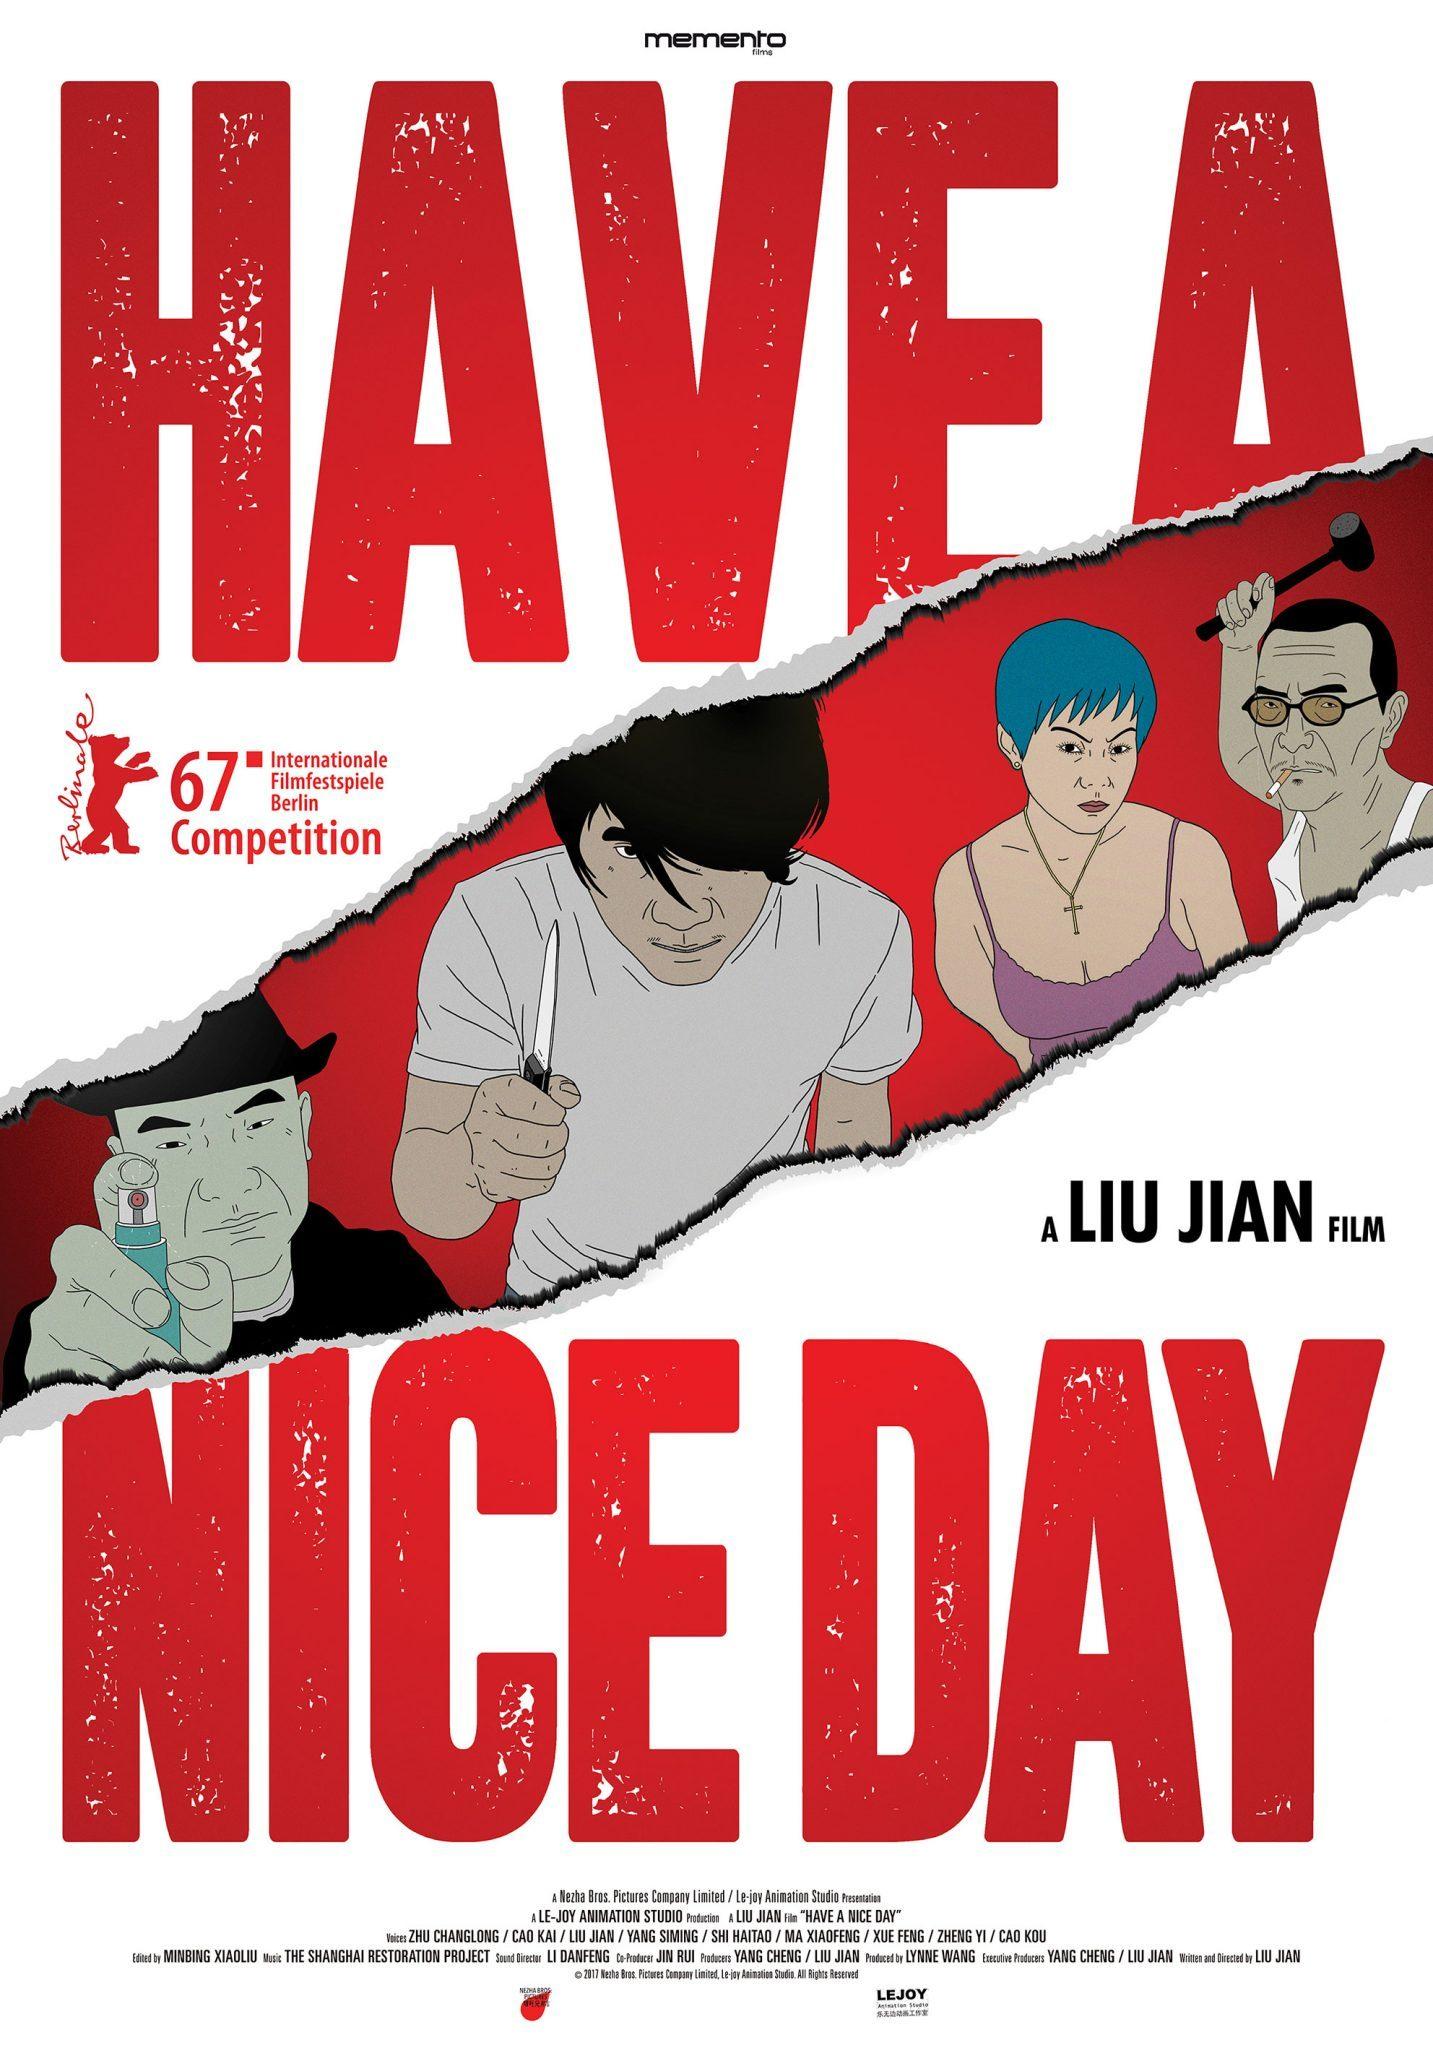 Festival international du film d'animation d'Annecy 2017 affiche Have A Nice Day